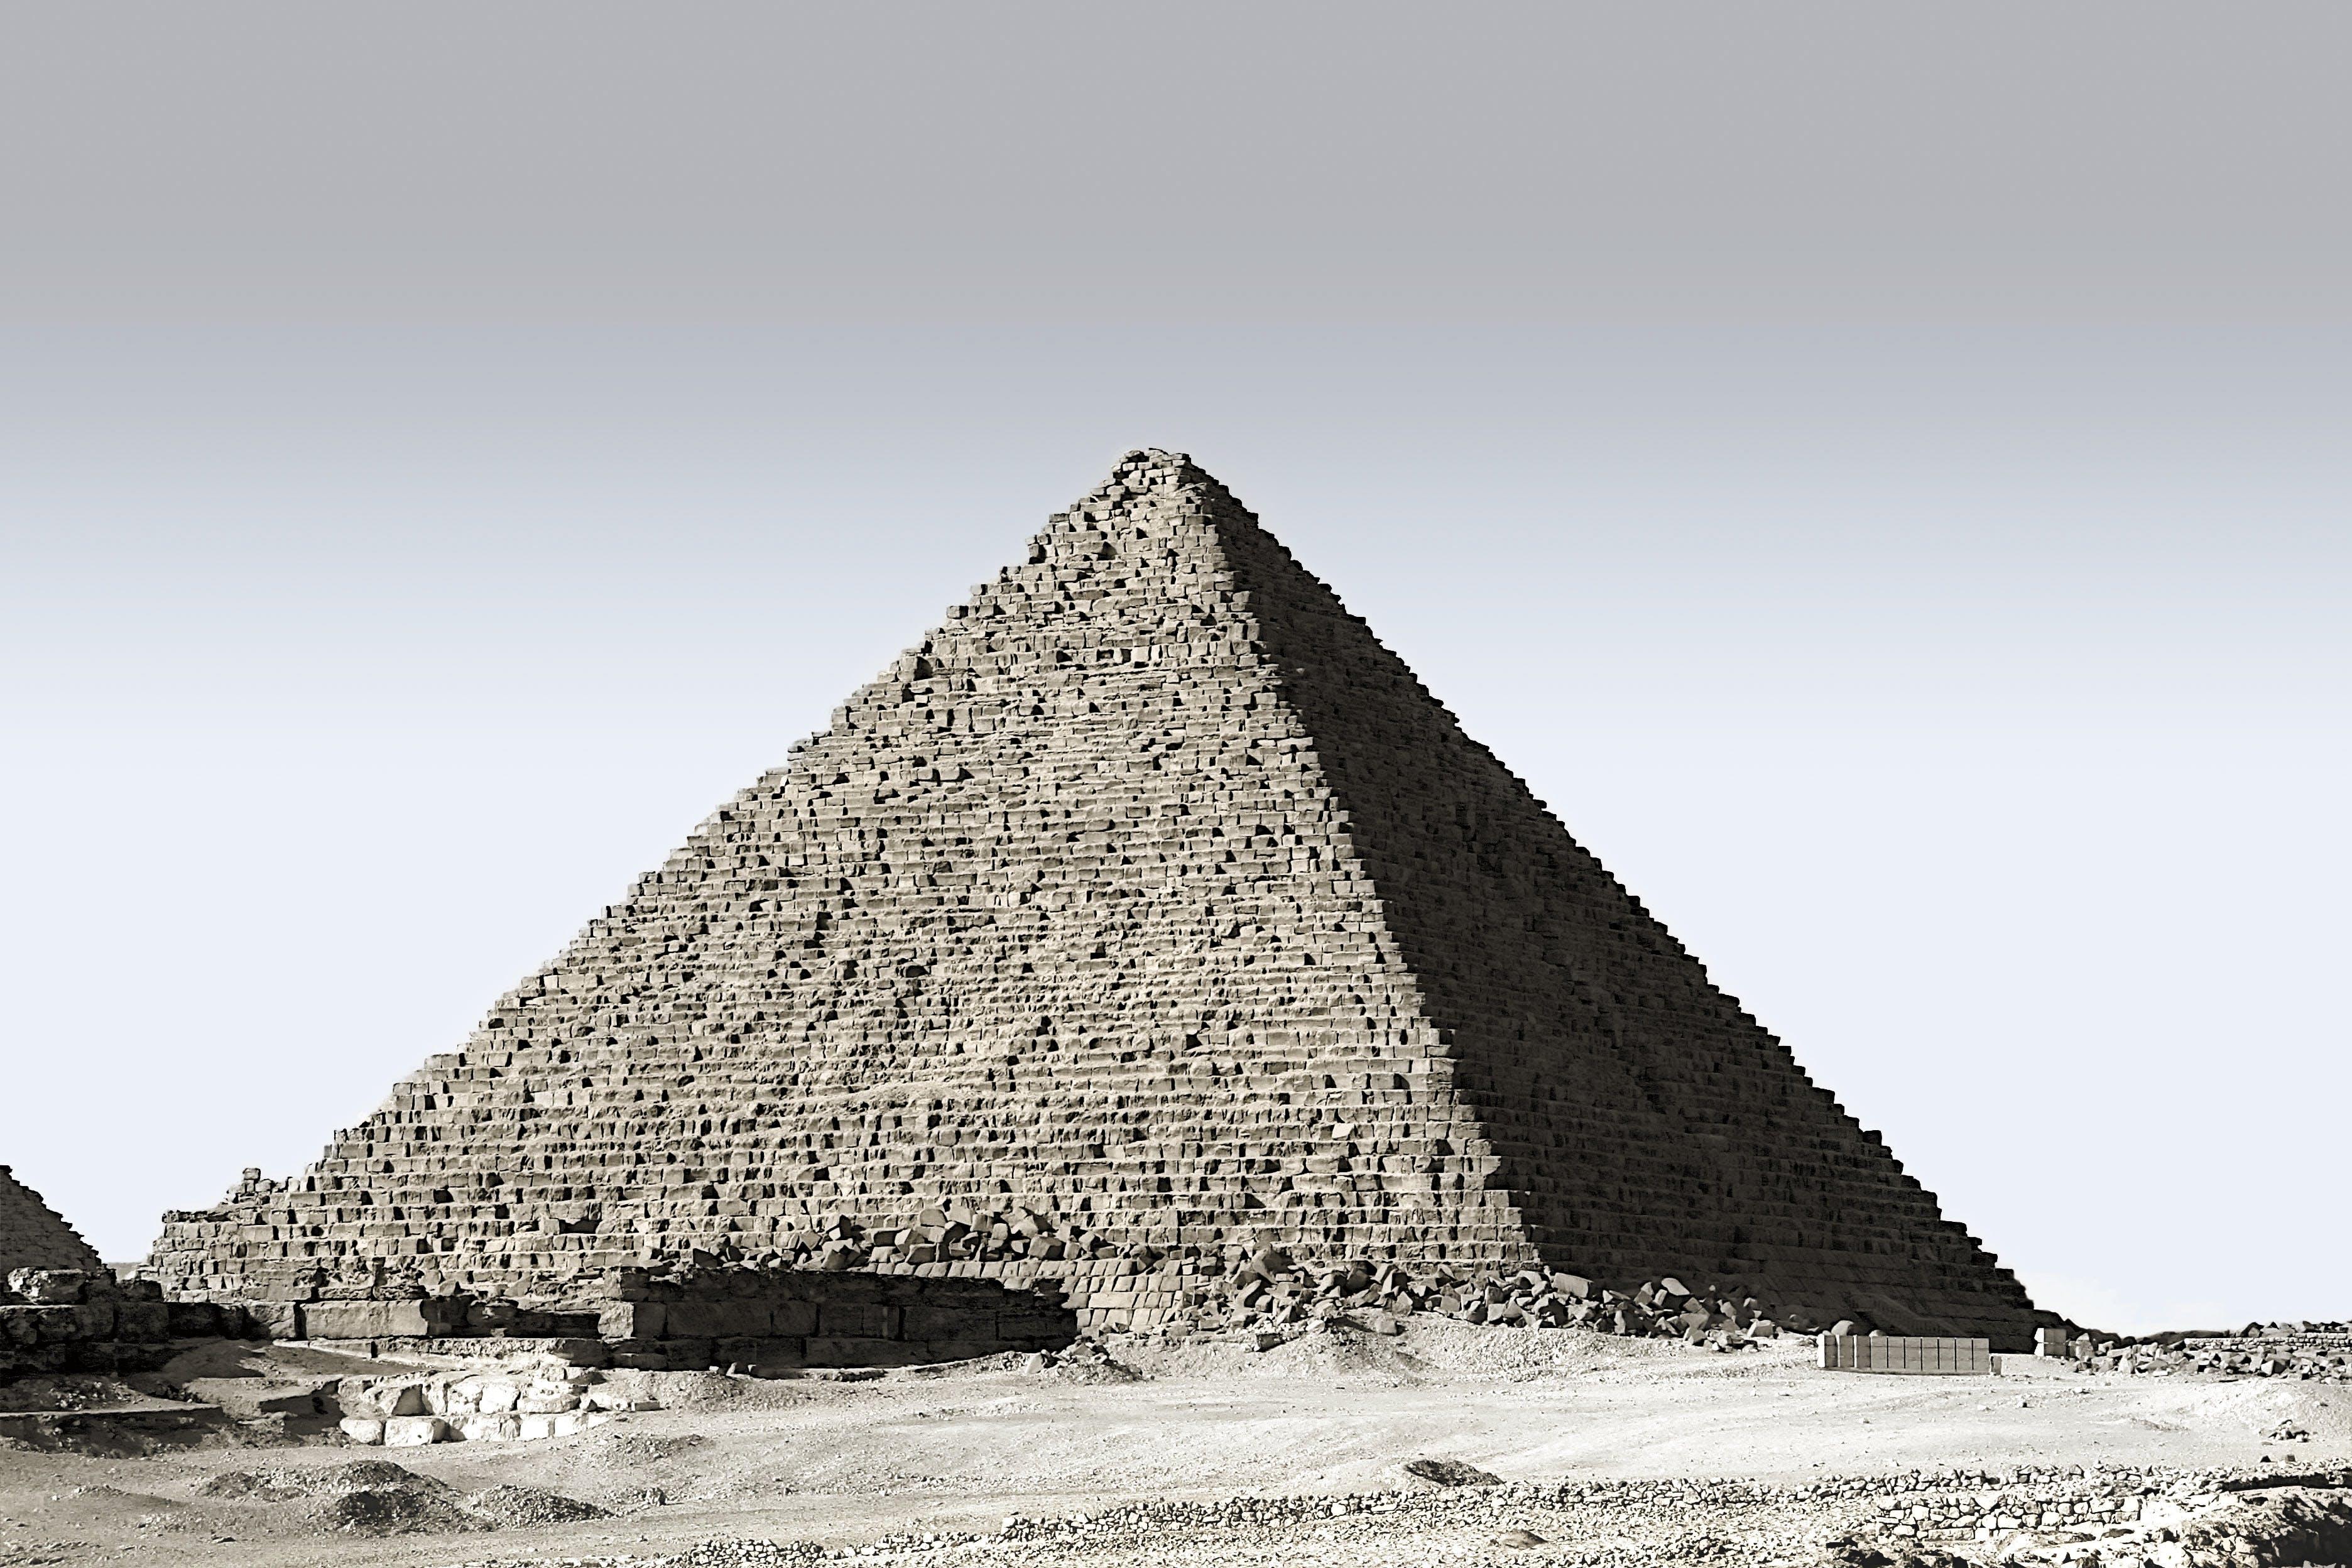 Photo of Great Pyramid of Giza